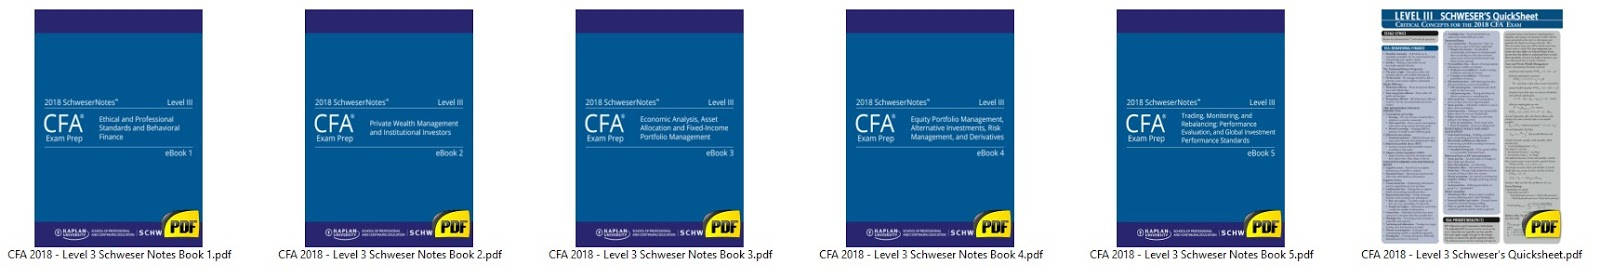 2018 Cfa Level 1 Schweser Study Notes Book Pdf {Nhs Alumni}